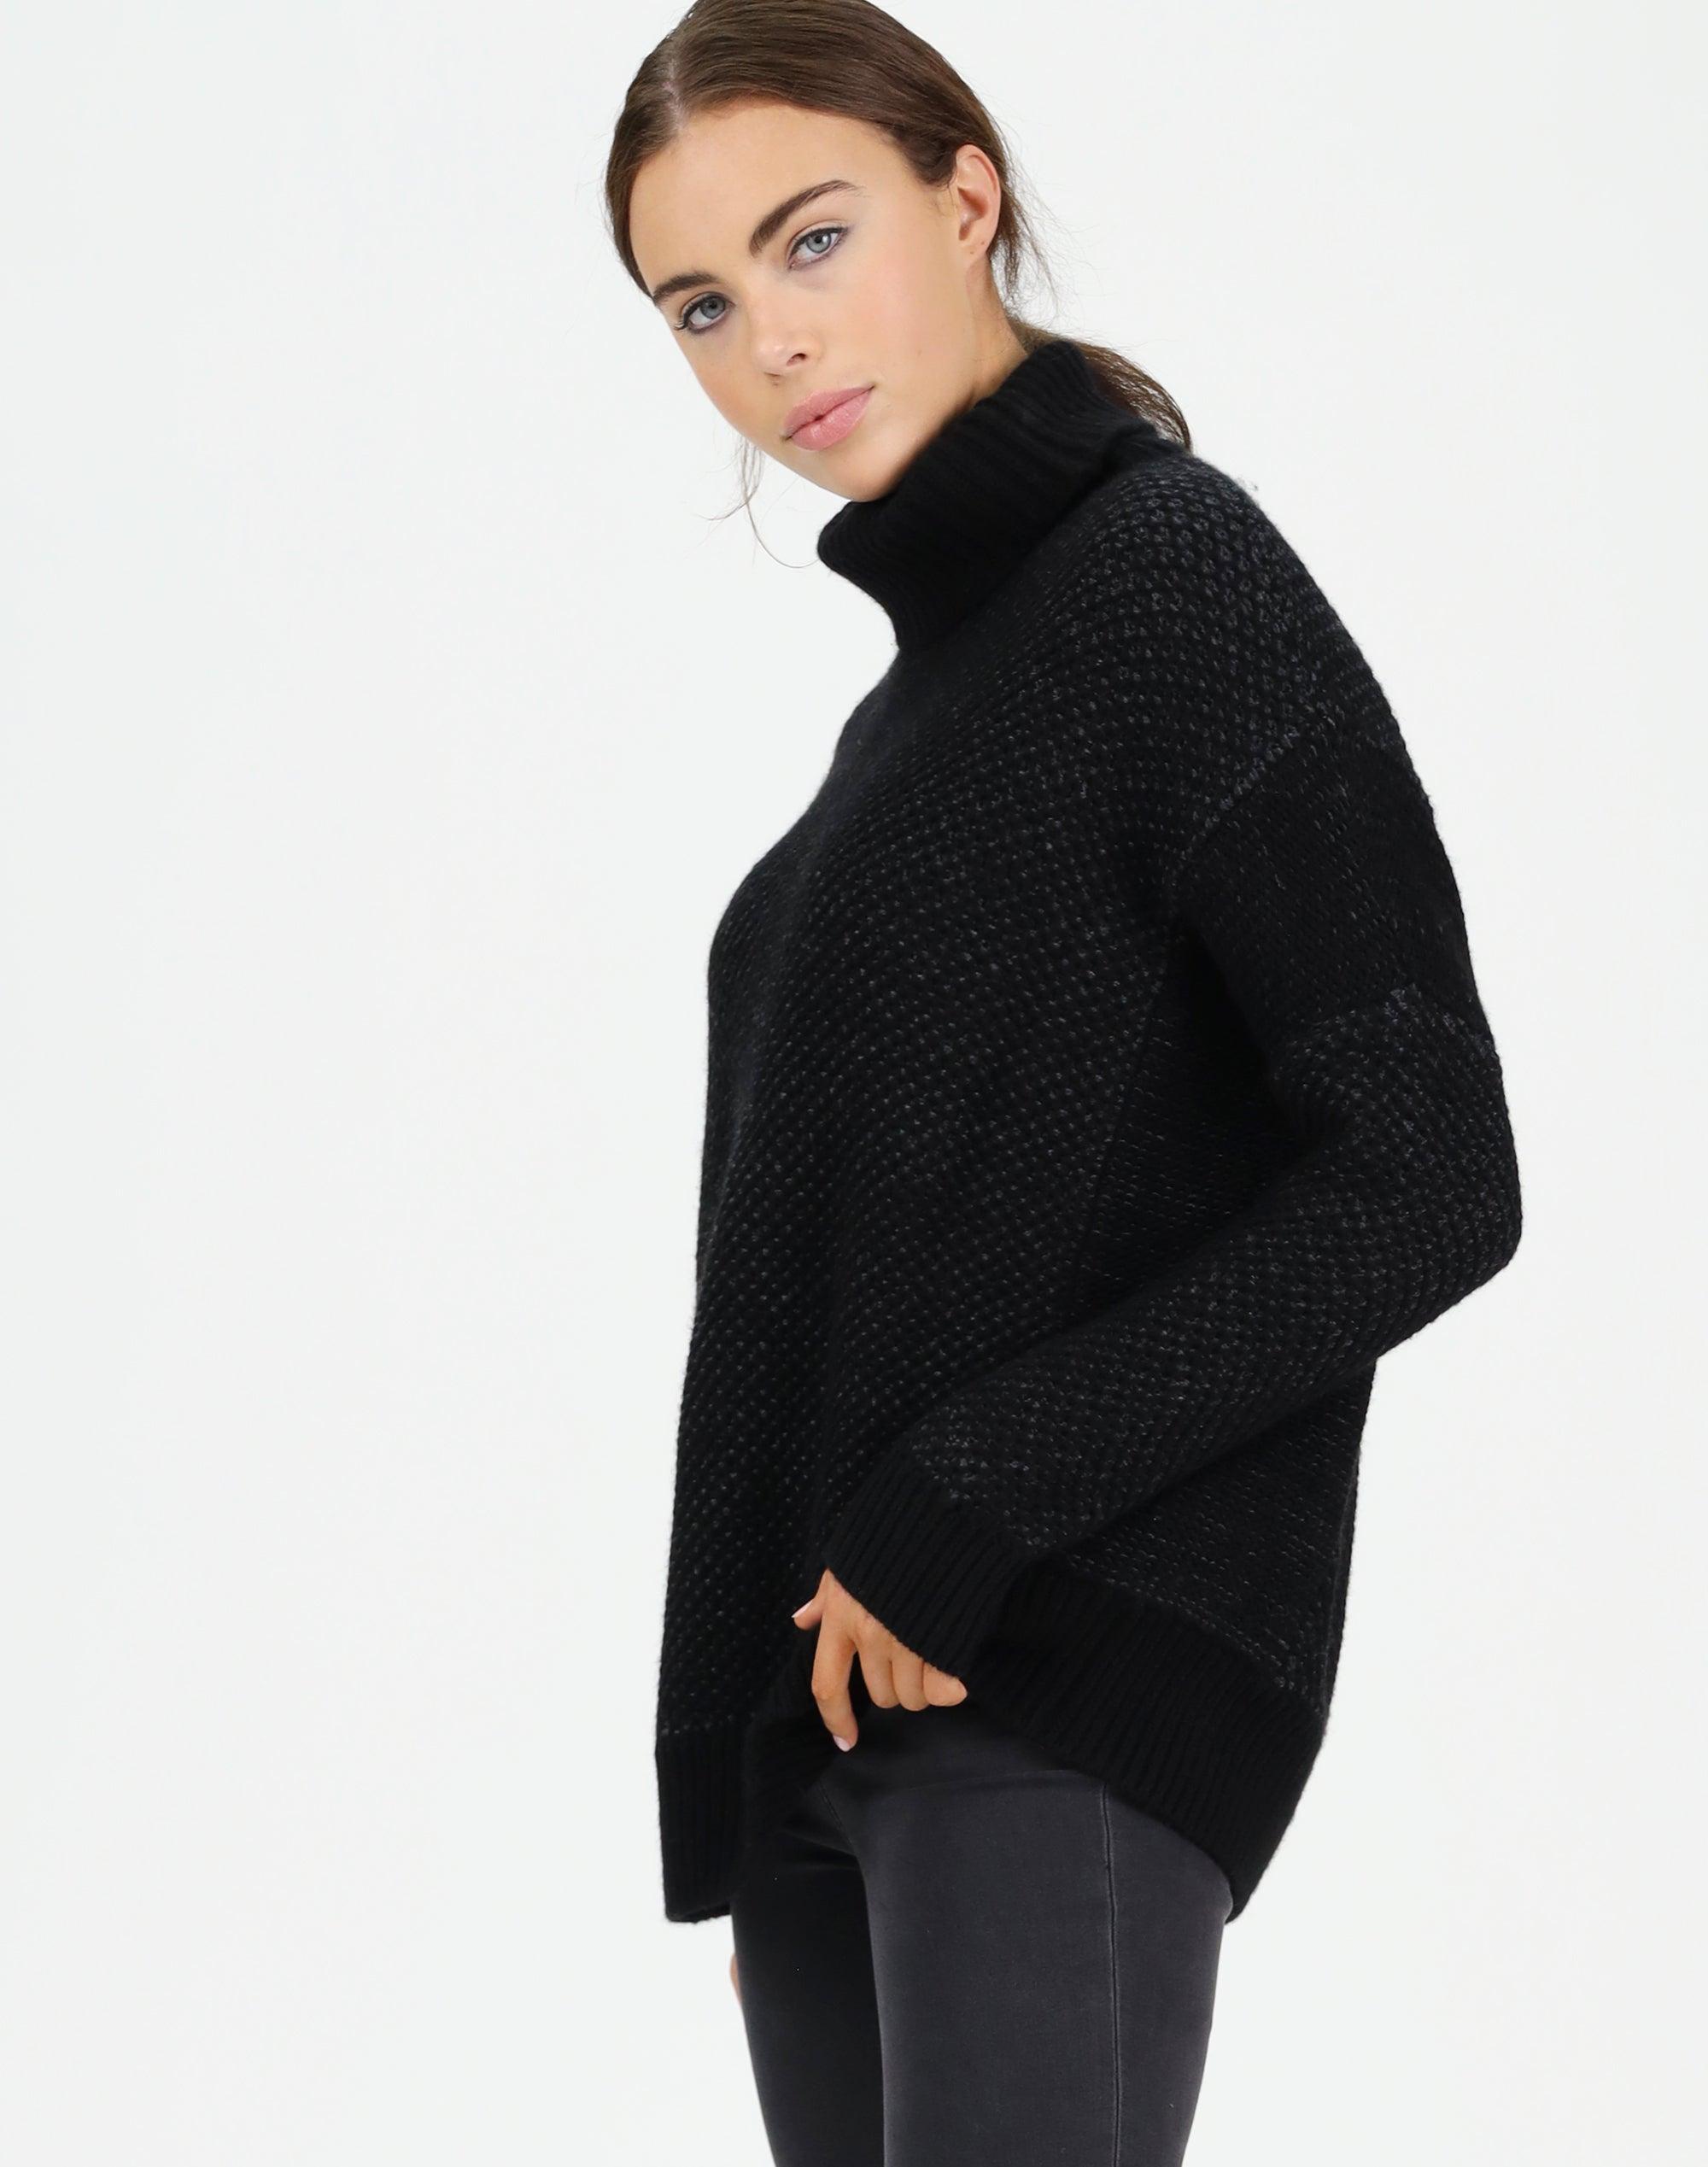 Moss Stitch Sweater